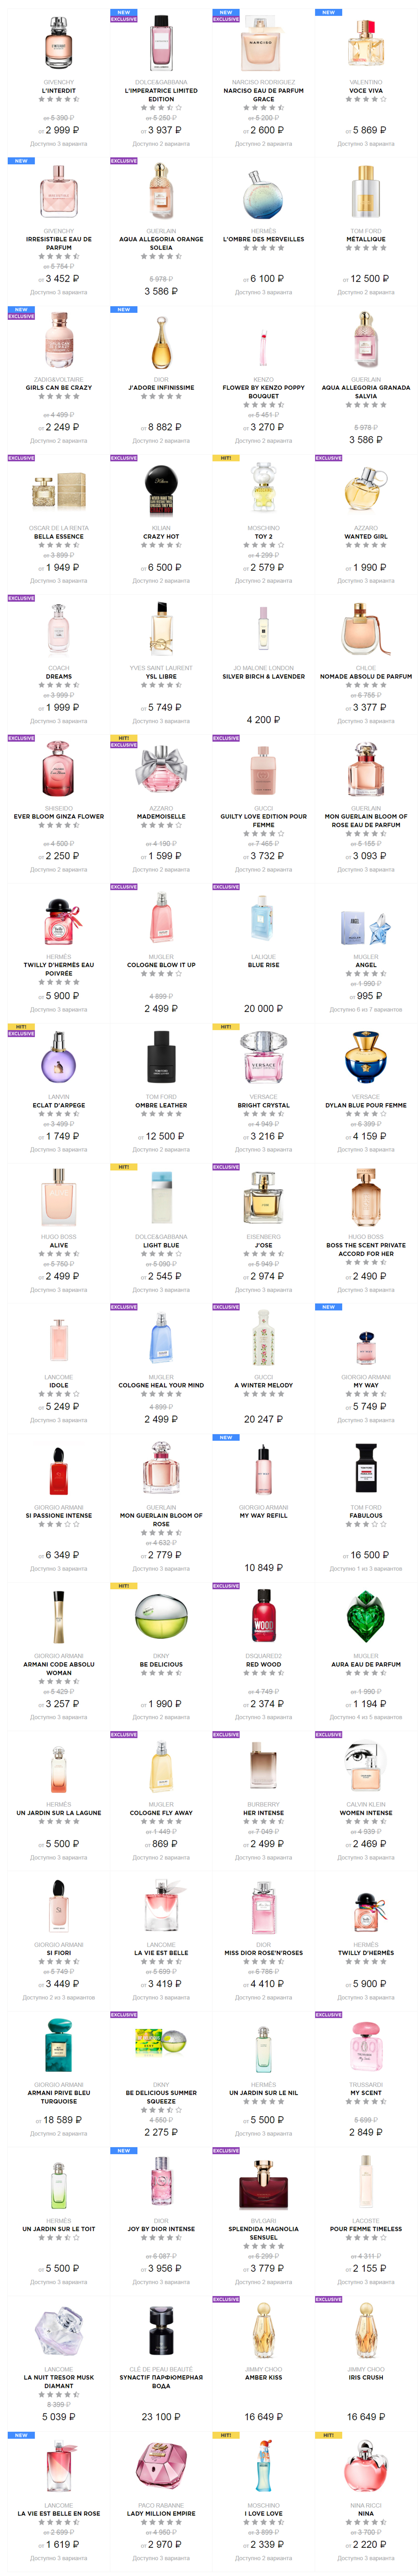 Каталог Летуаль - Женская парфюмерия